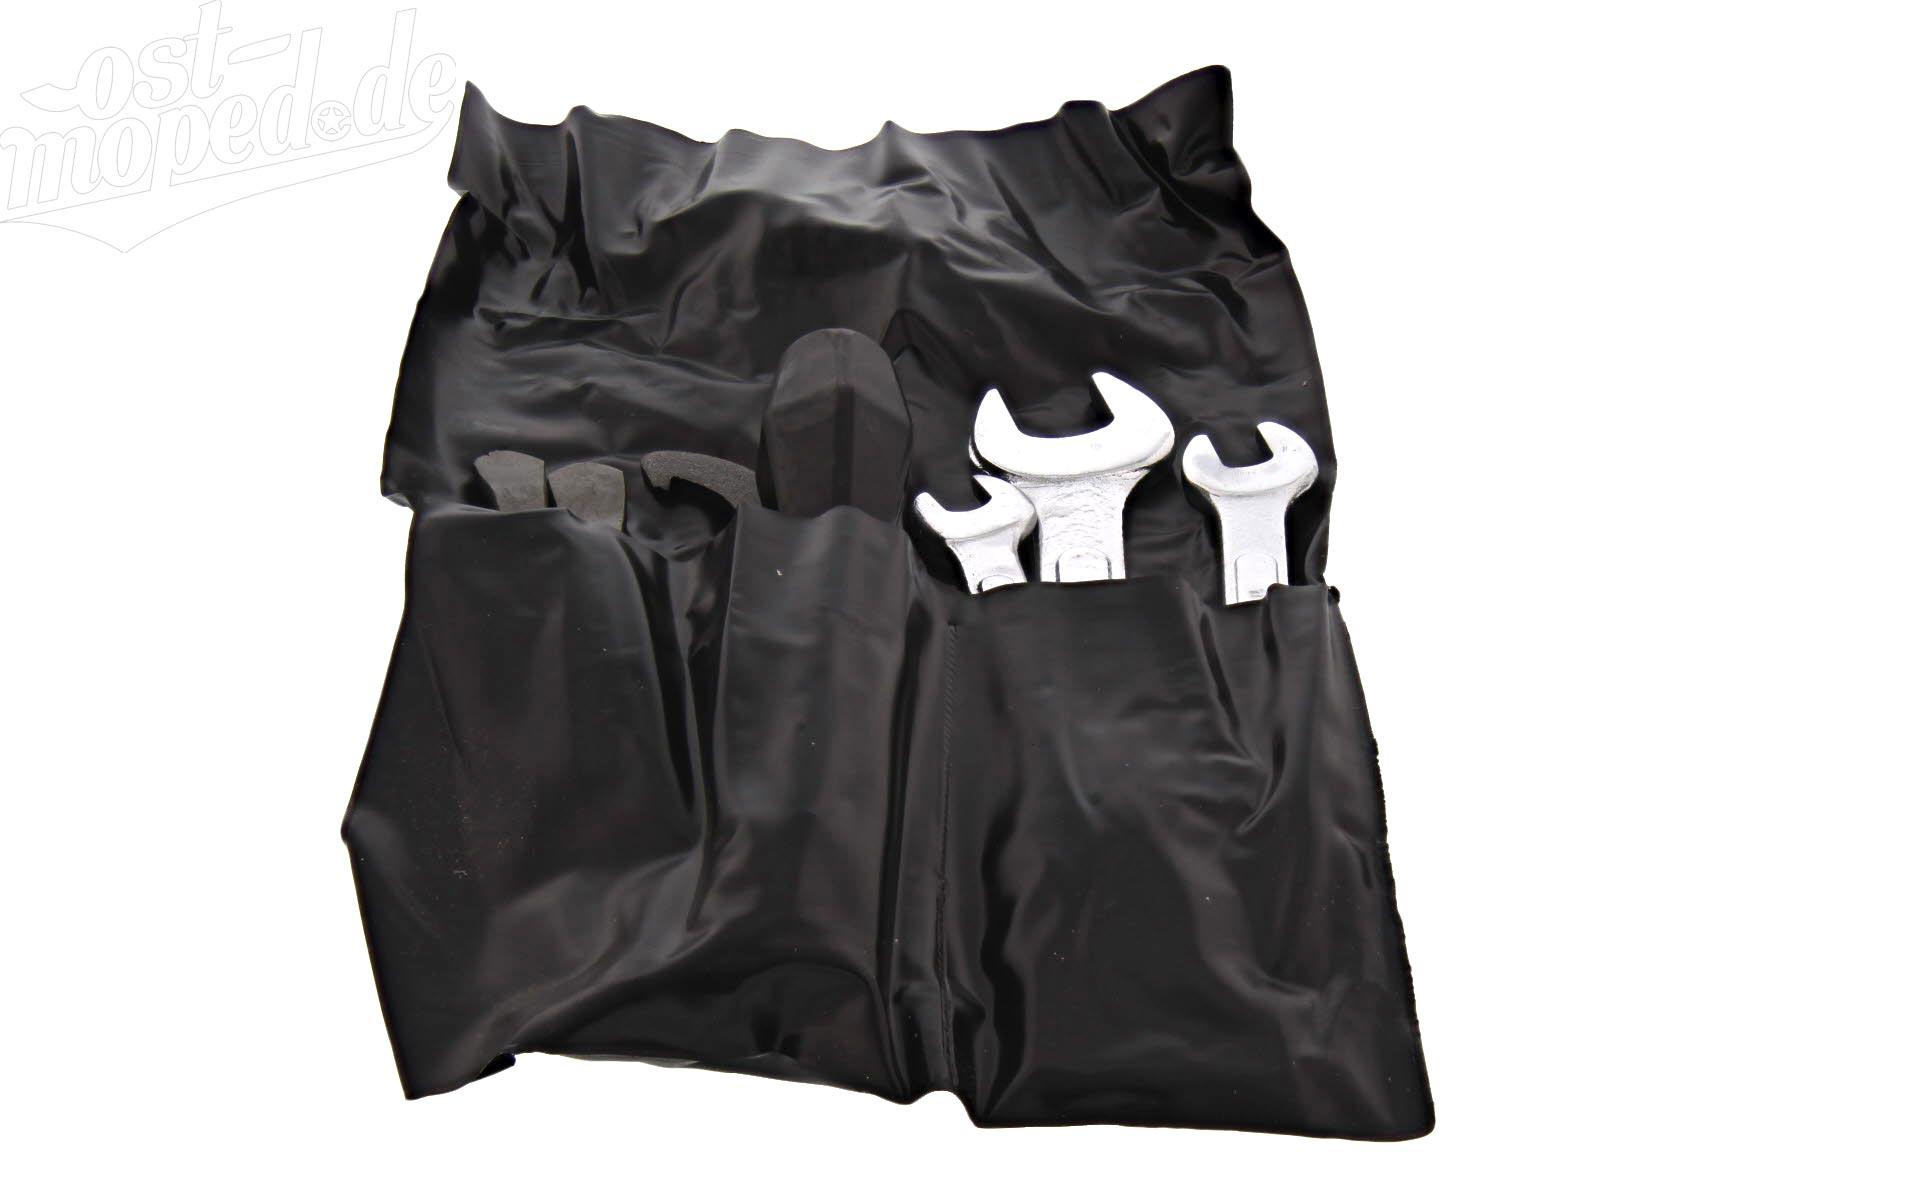 Werkzeugtasche SET (10-teilig) gepackt - Simson - Bordwerkzeug